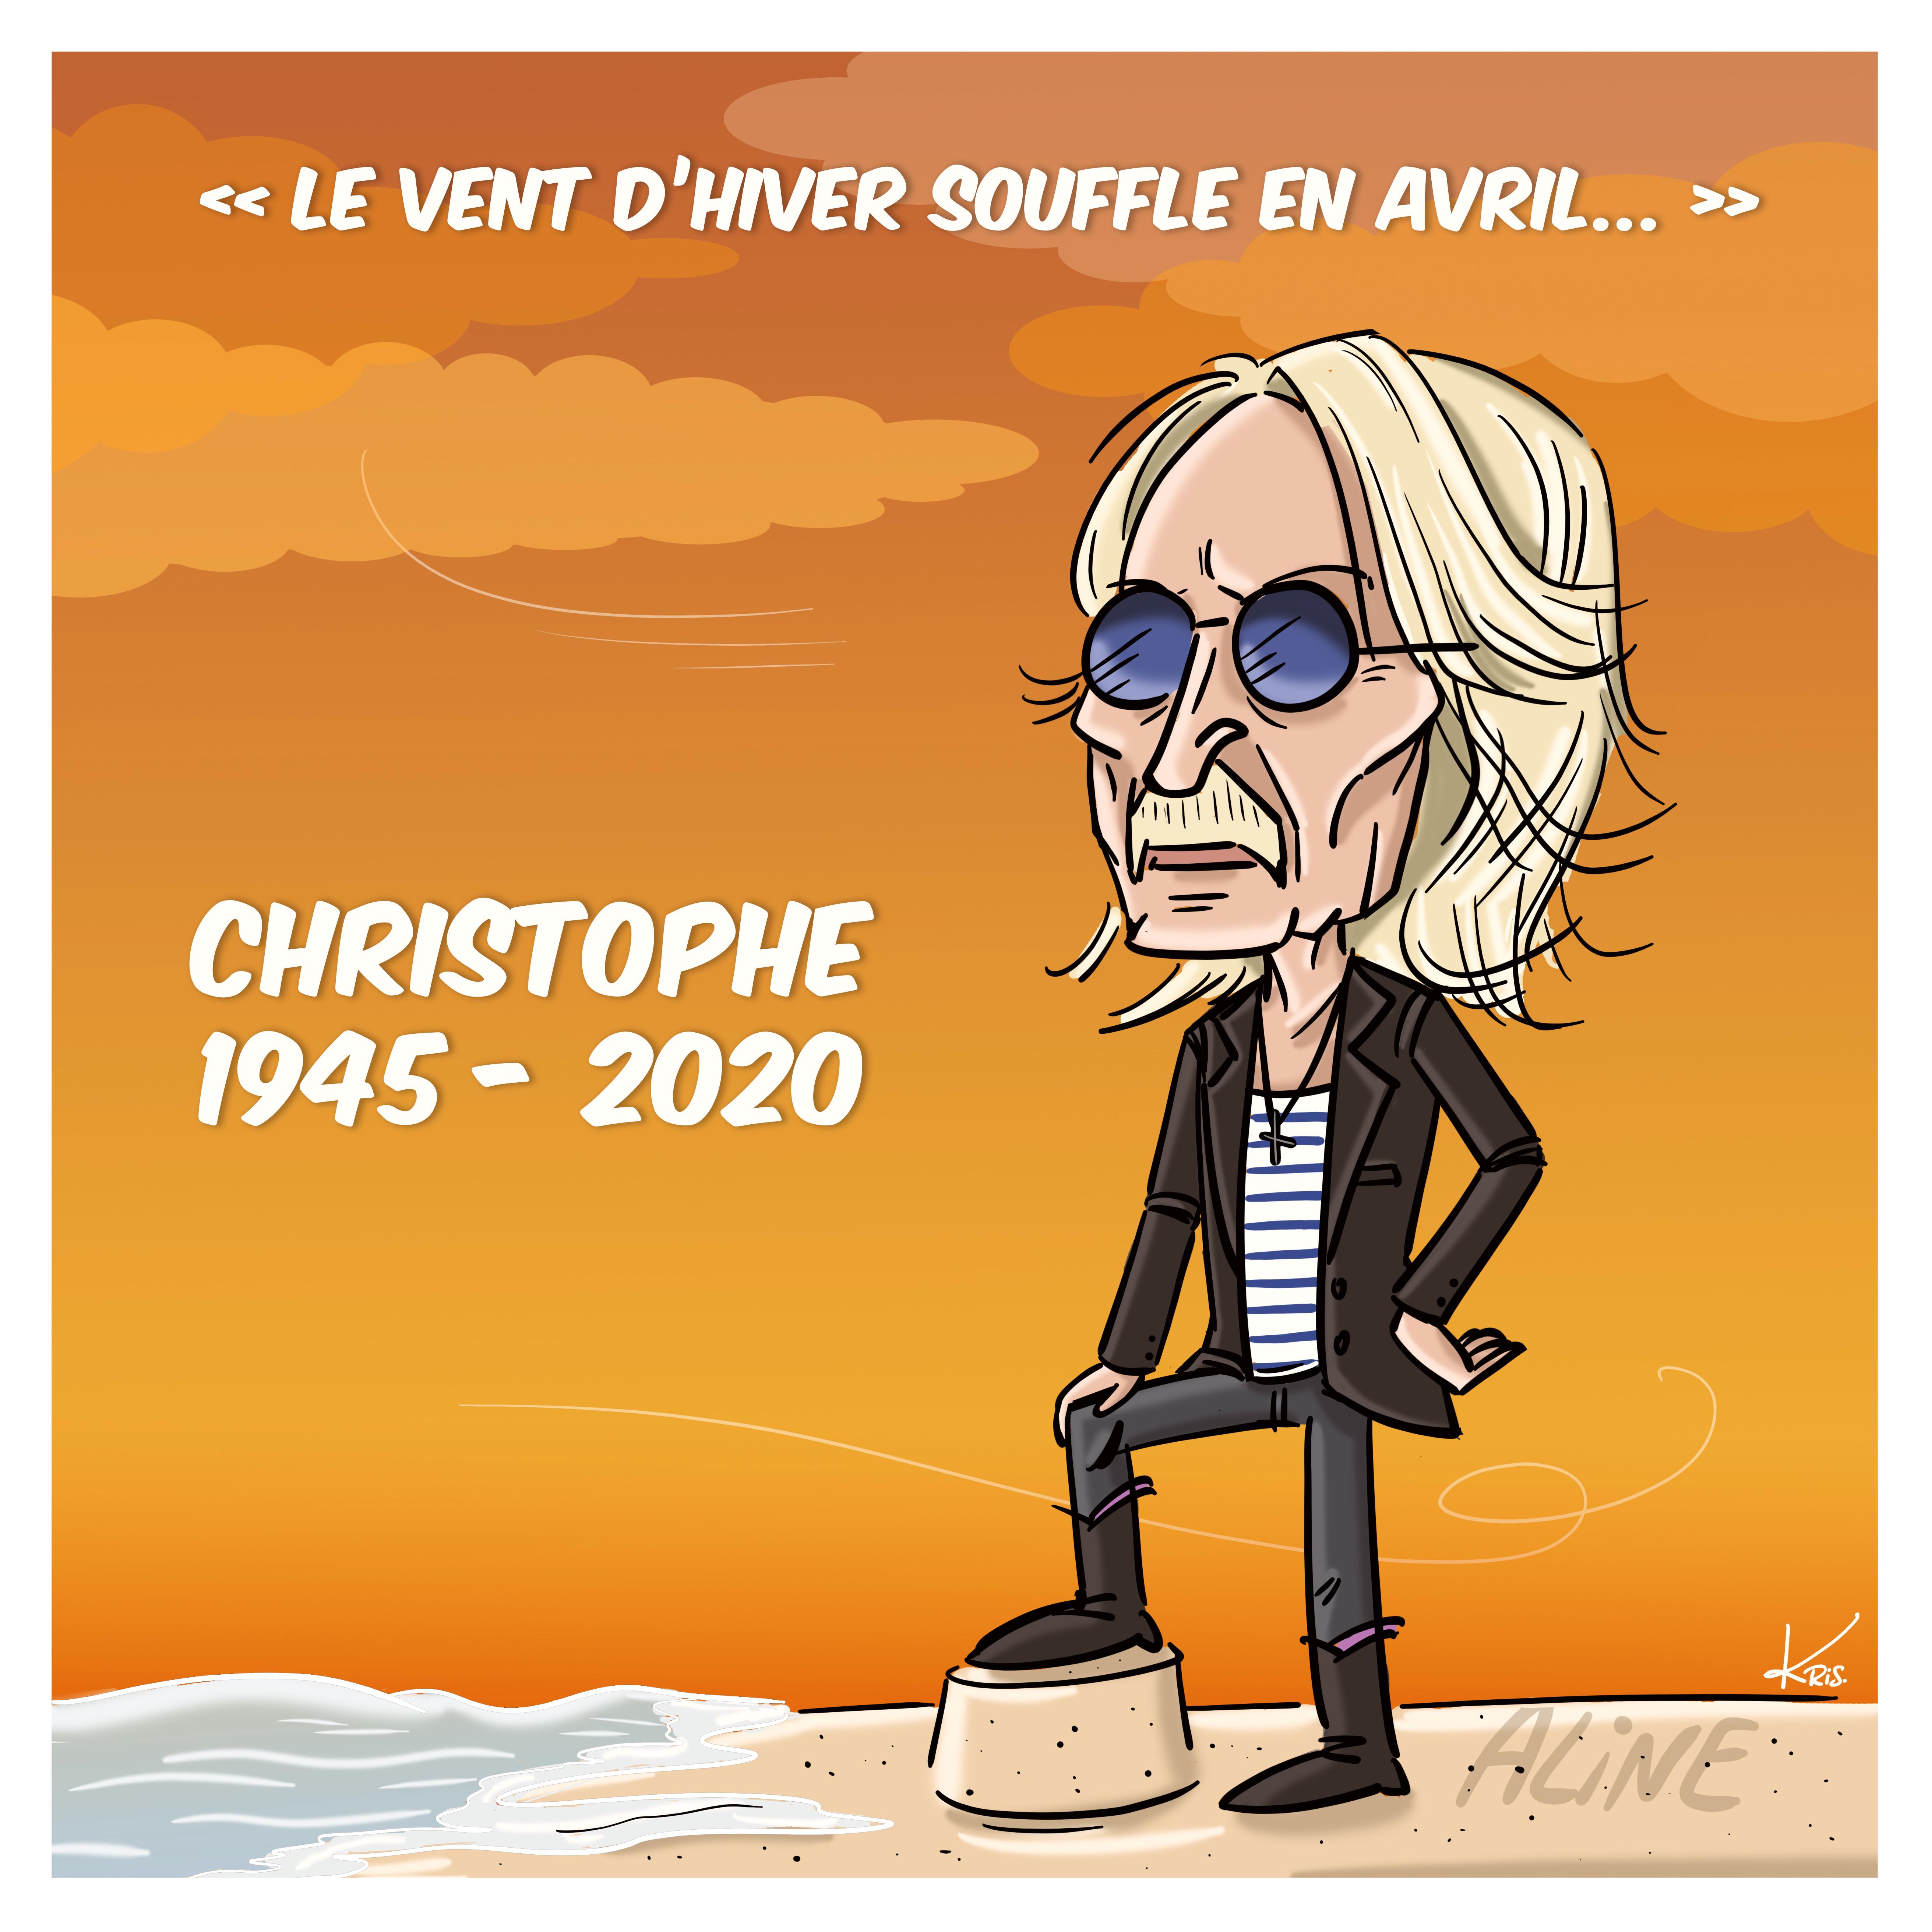 Kris Parenti - Christophe